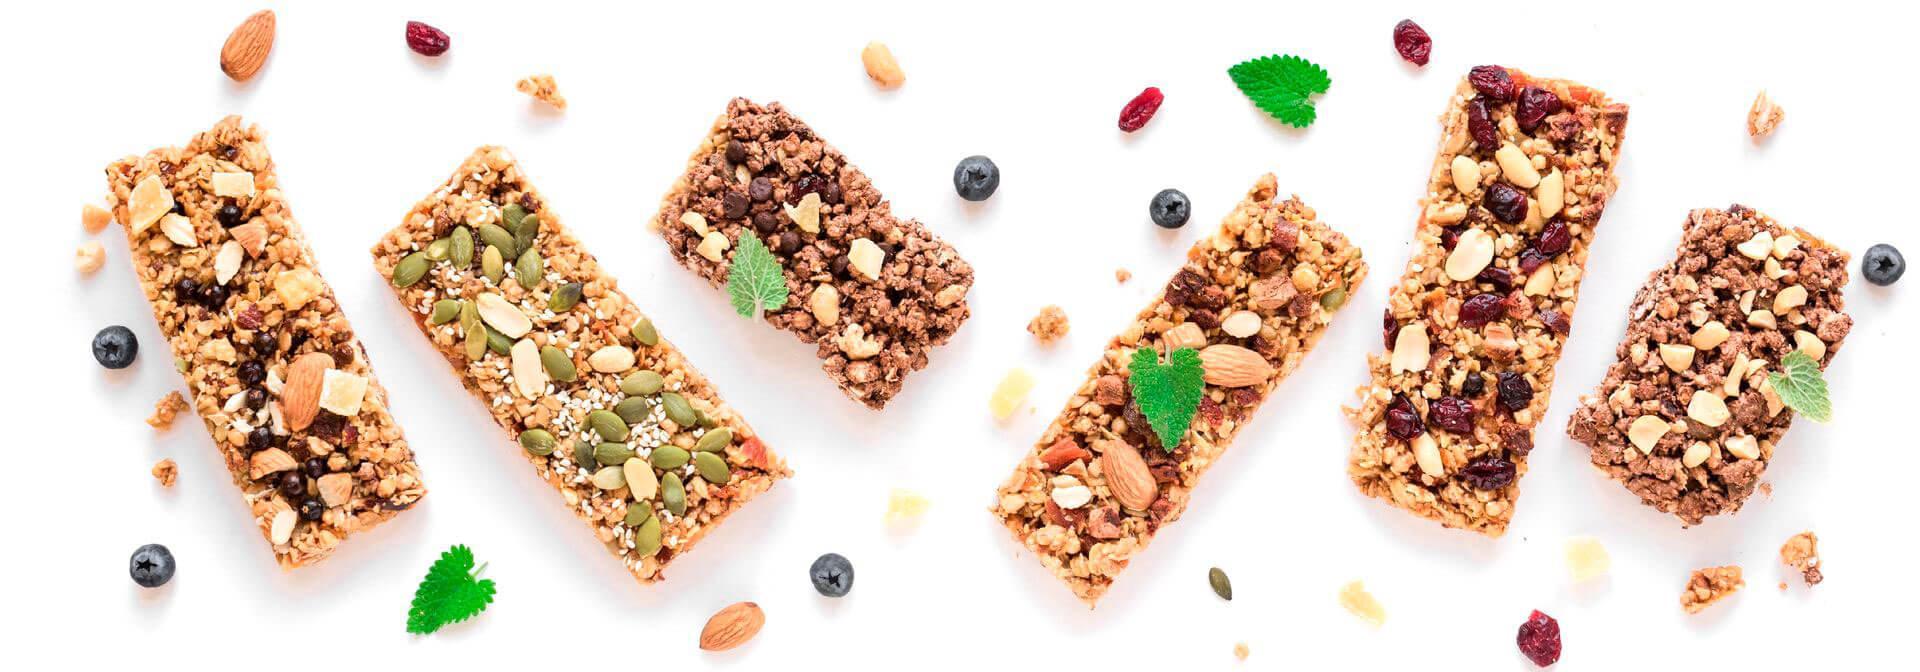 Homemade healthy snack-granola vegan protein bars